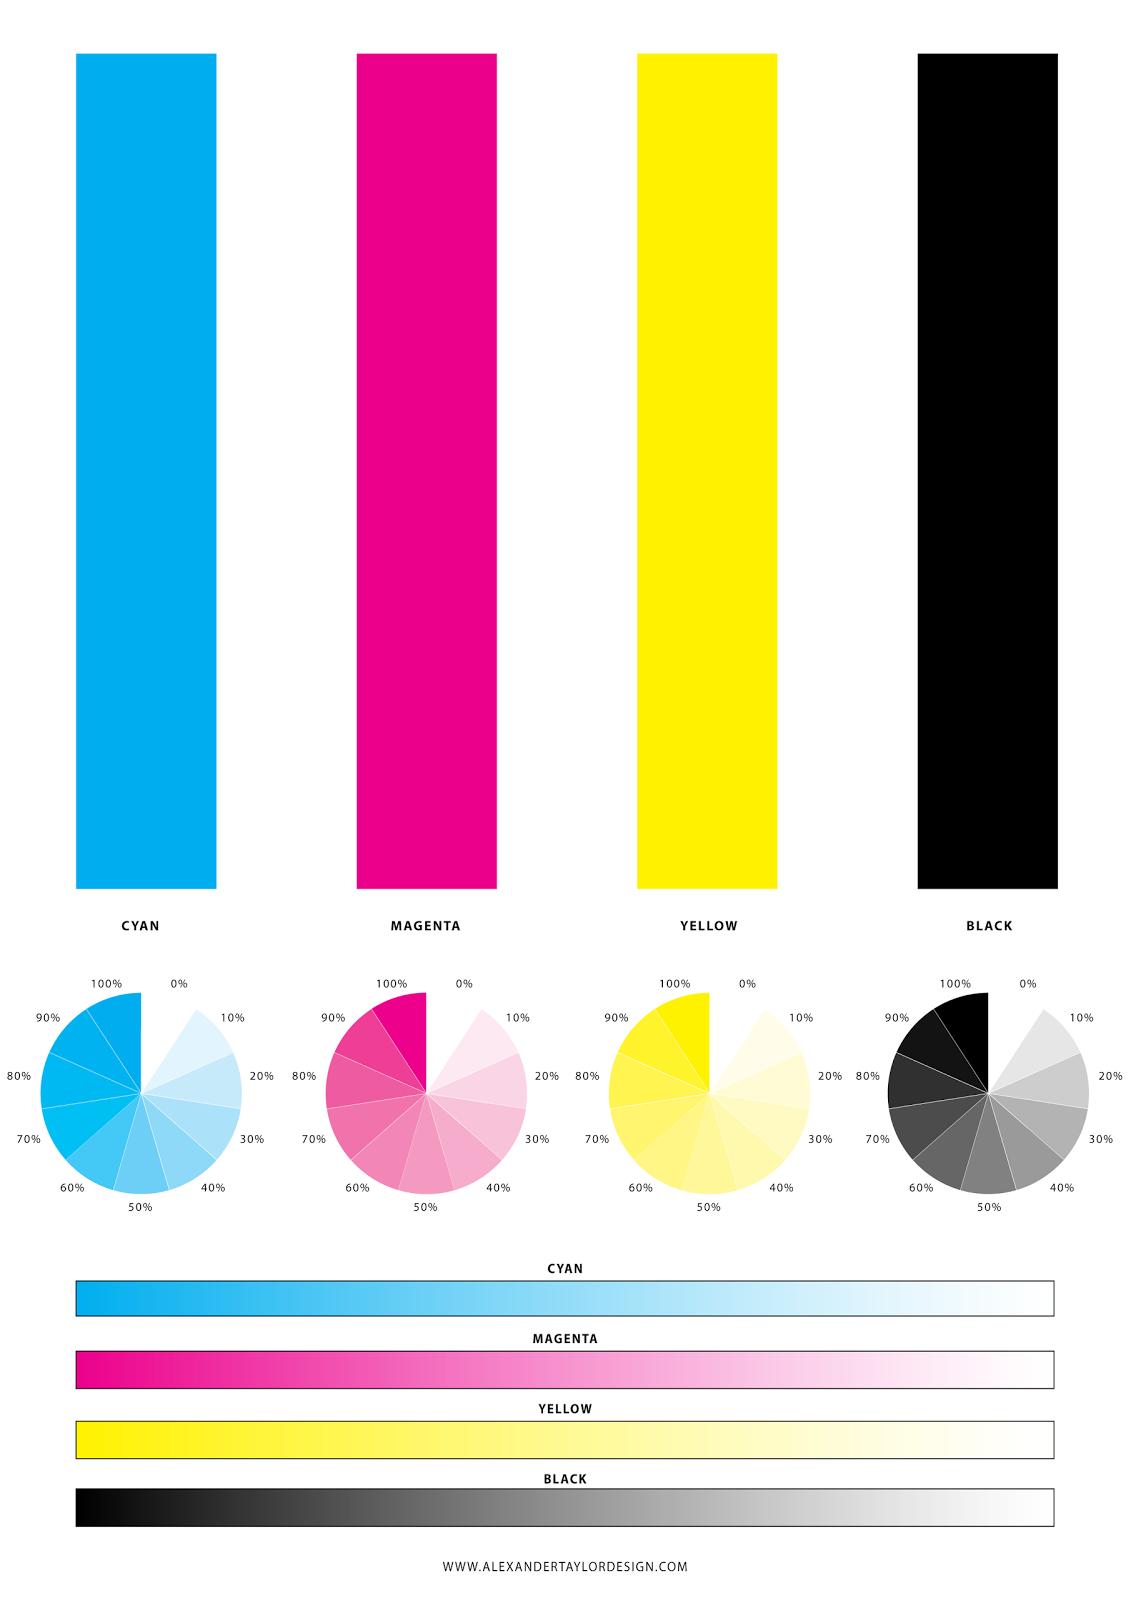 Test Warna Printer : warna, printer, Printer, Images